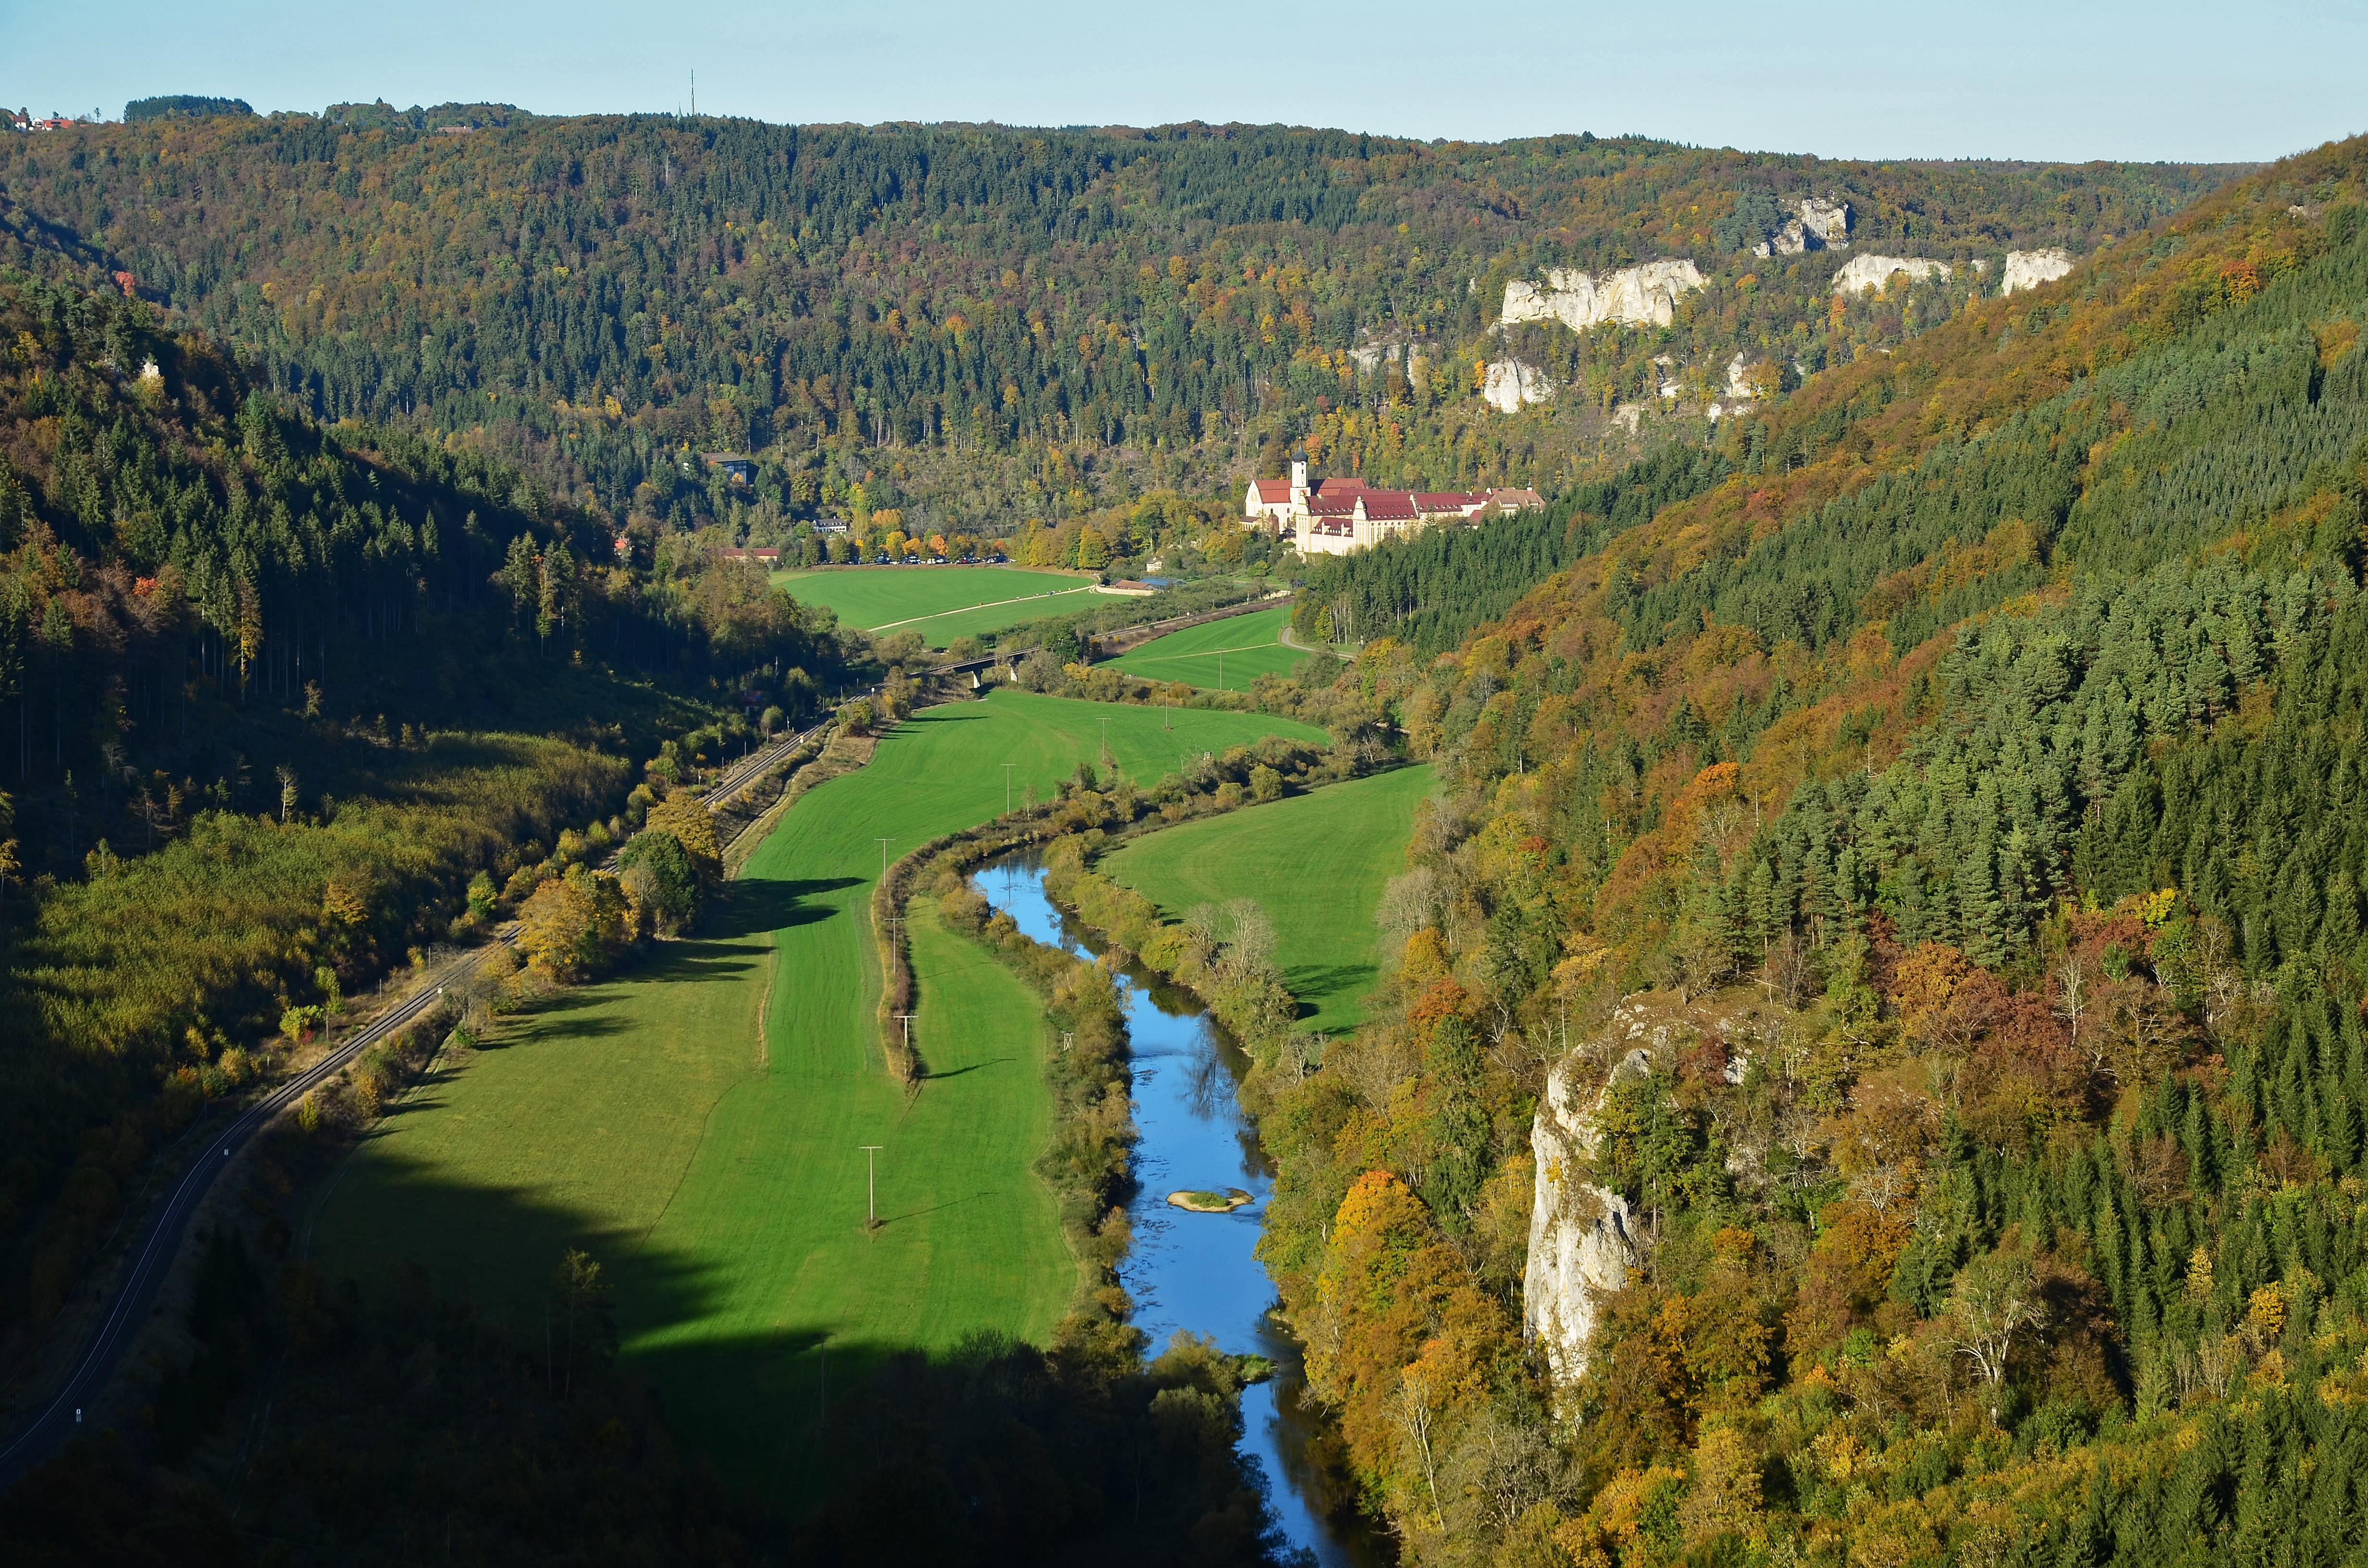 Naturpark Obere Donau, Blick ins Donautal zum Kloser Beuron.jpg